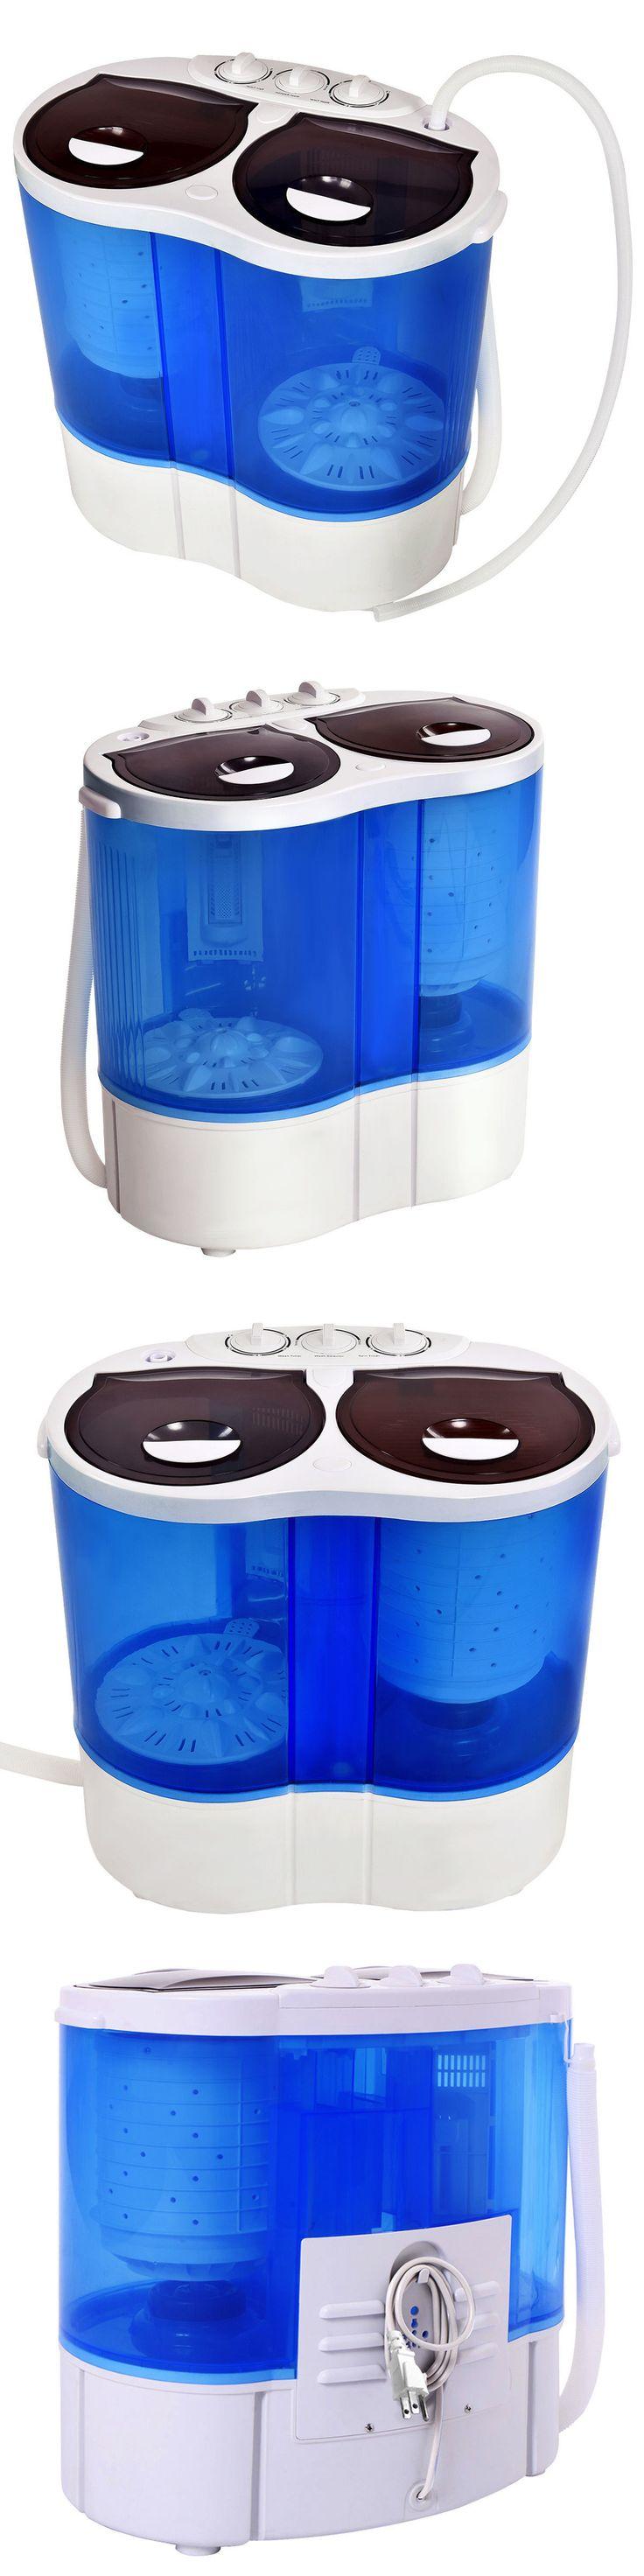 best 25 apartment washer ideas on pinterest laundry